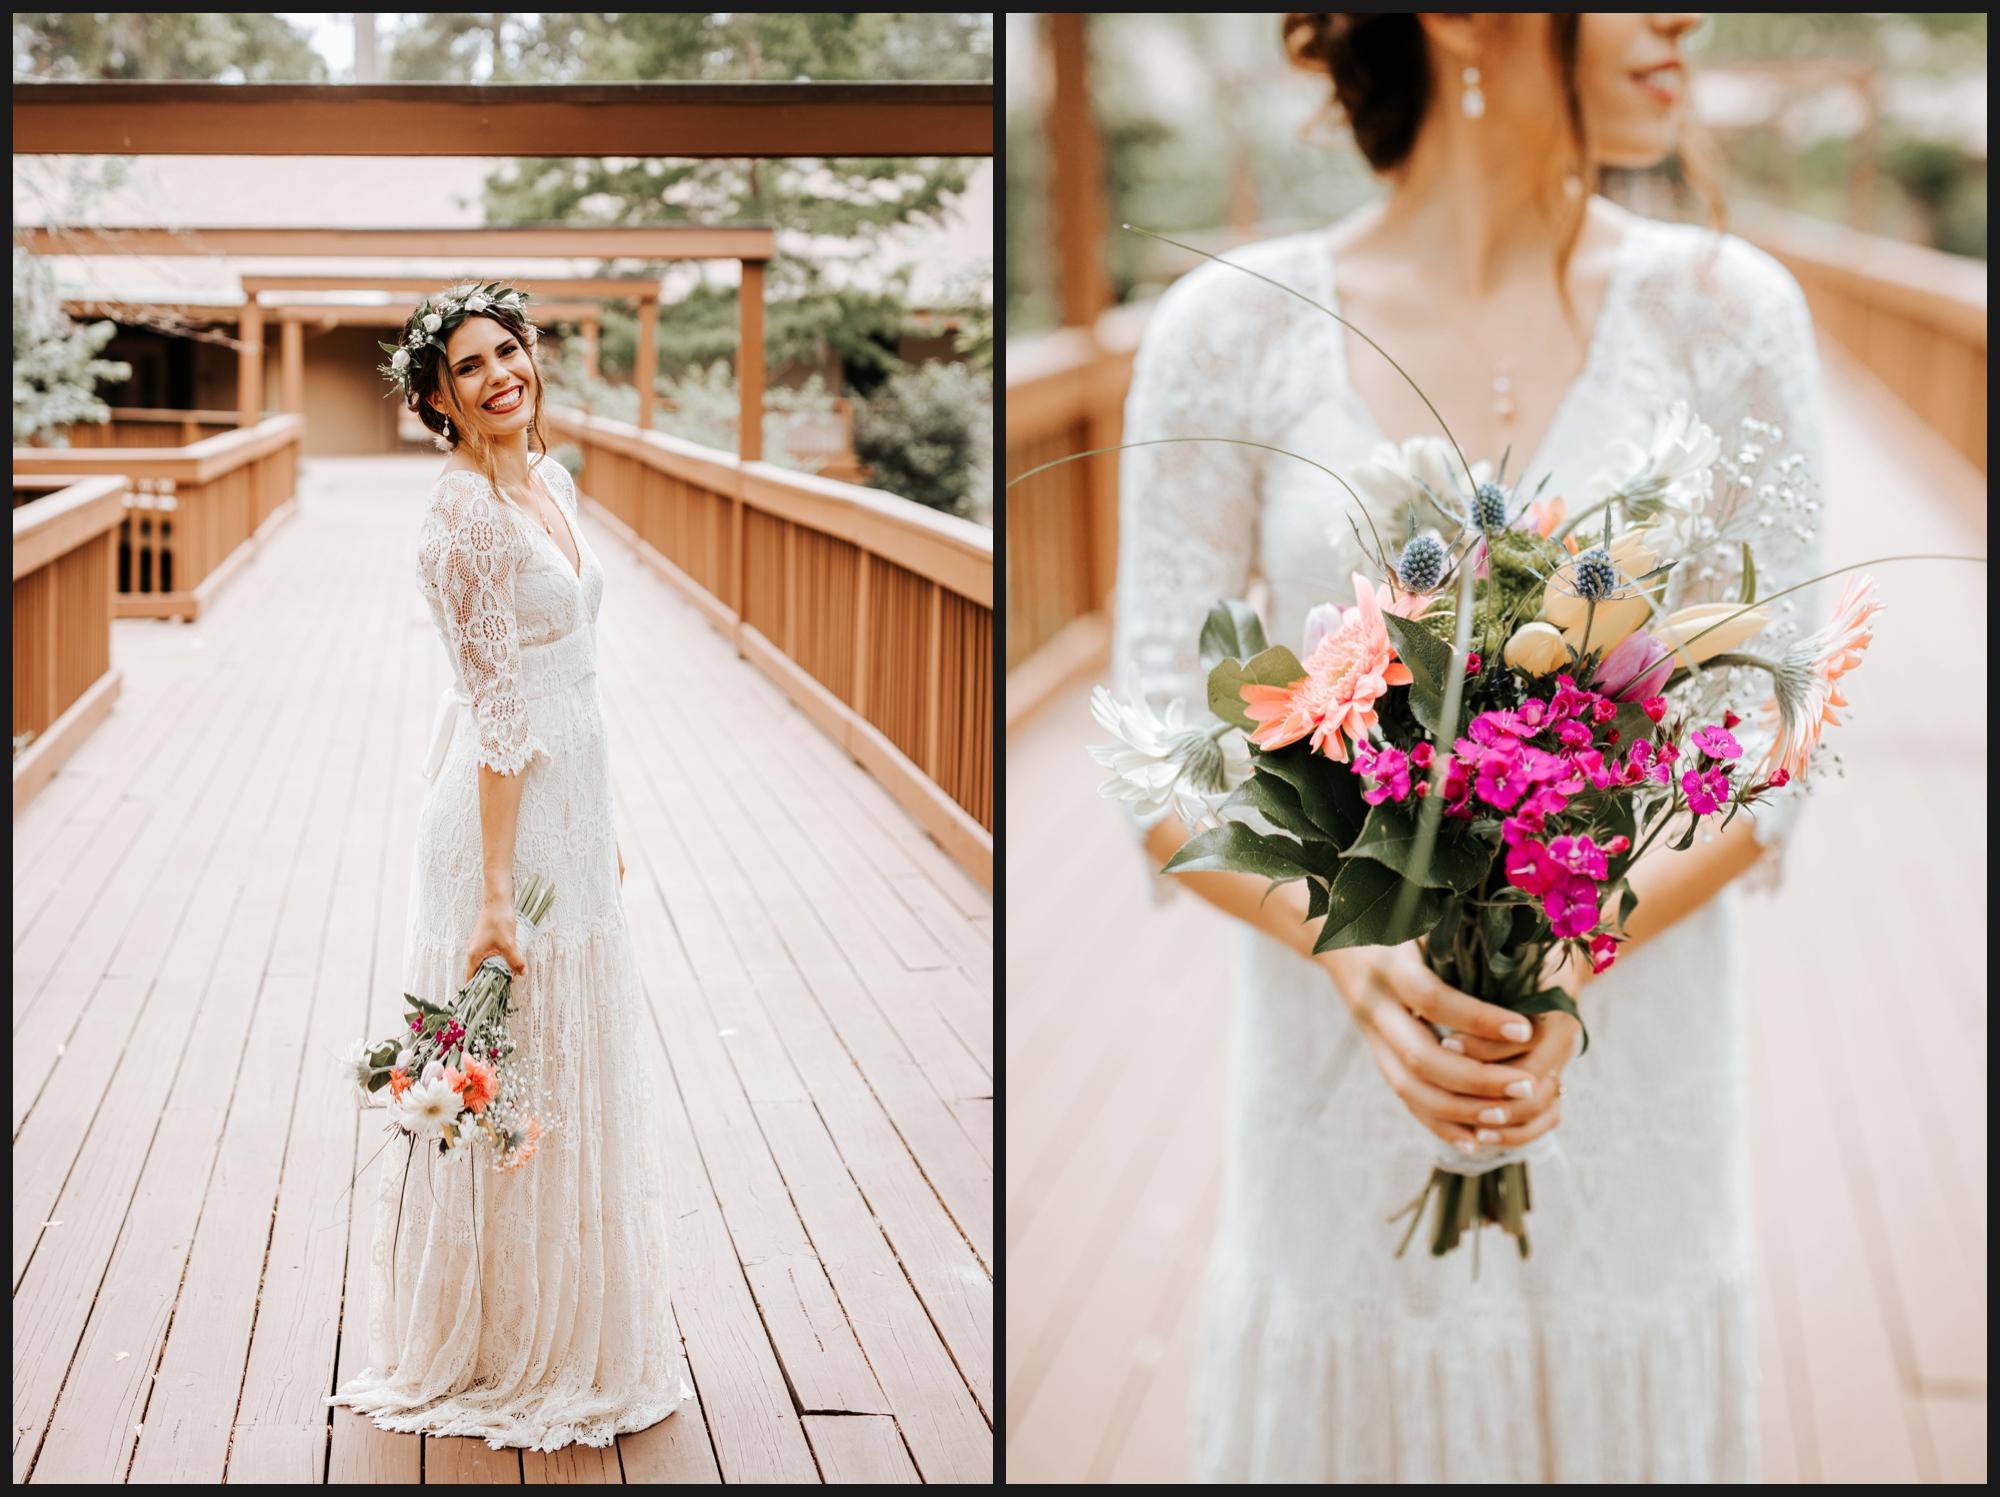 Orlando-Wedding-Photographer_0010.jpg